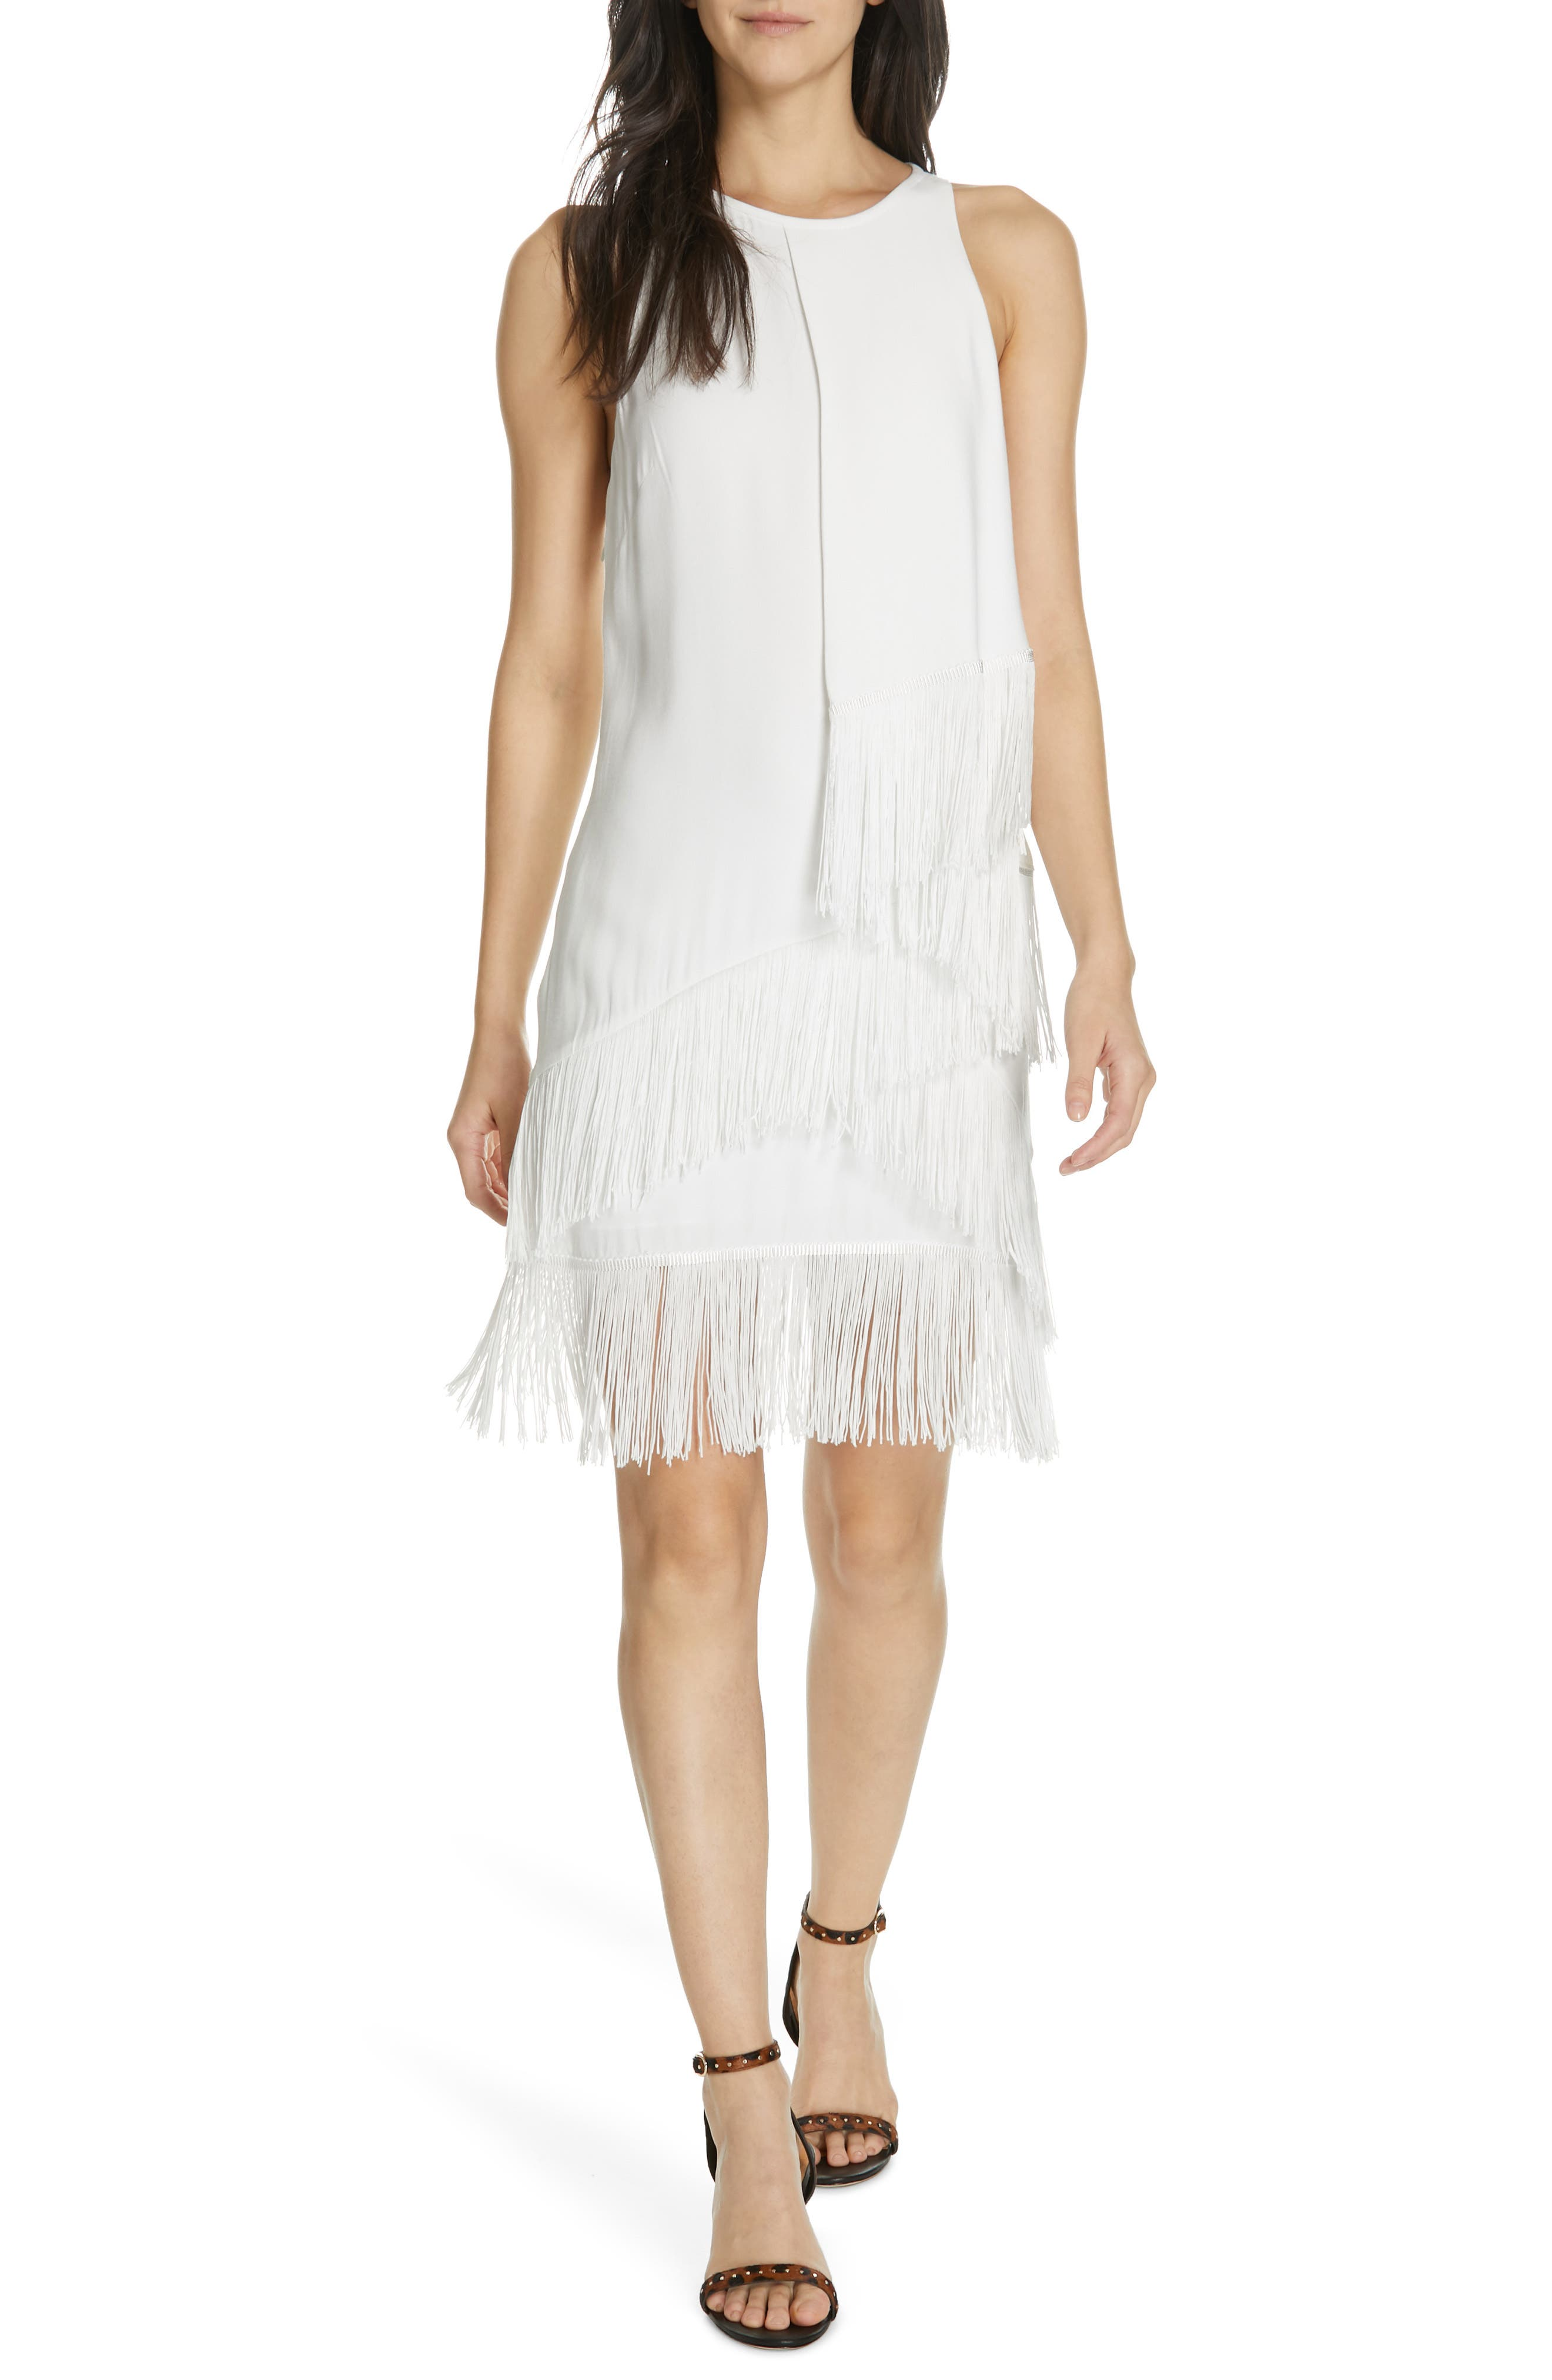 Joie Amiyah Tiered Fringe Dress, White